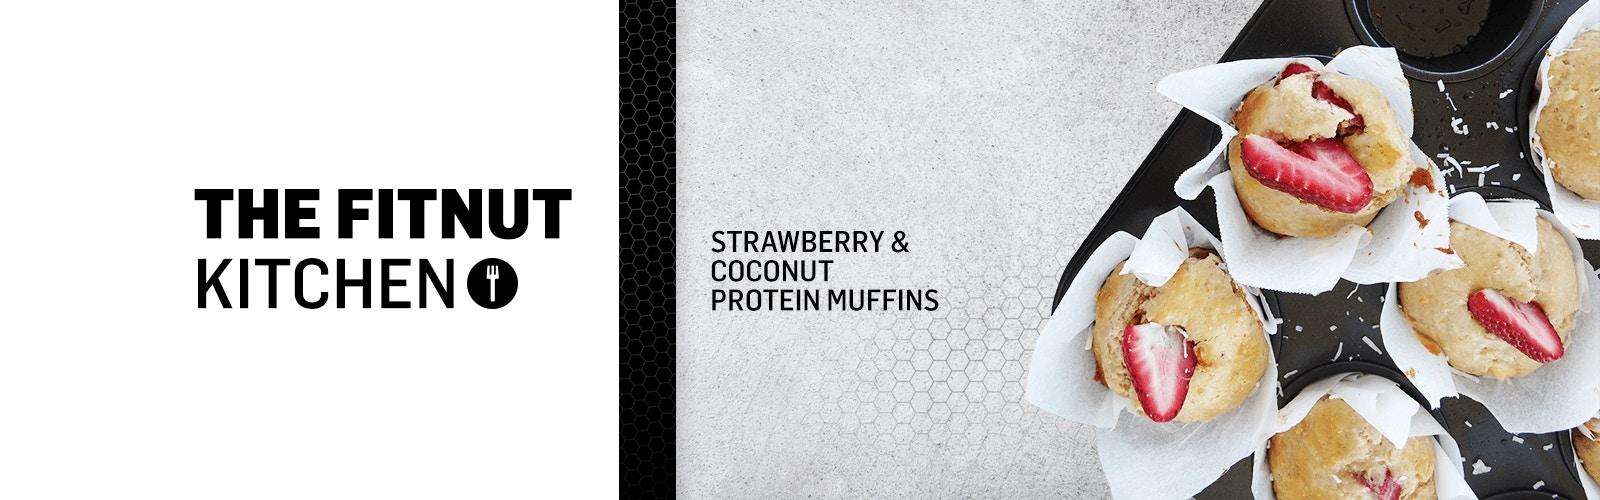 SIS - The Fitnut Kitchen - Protein Muffins